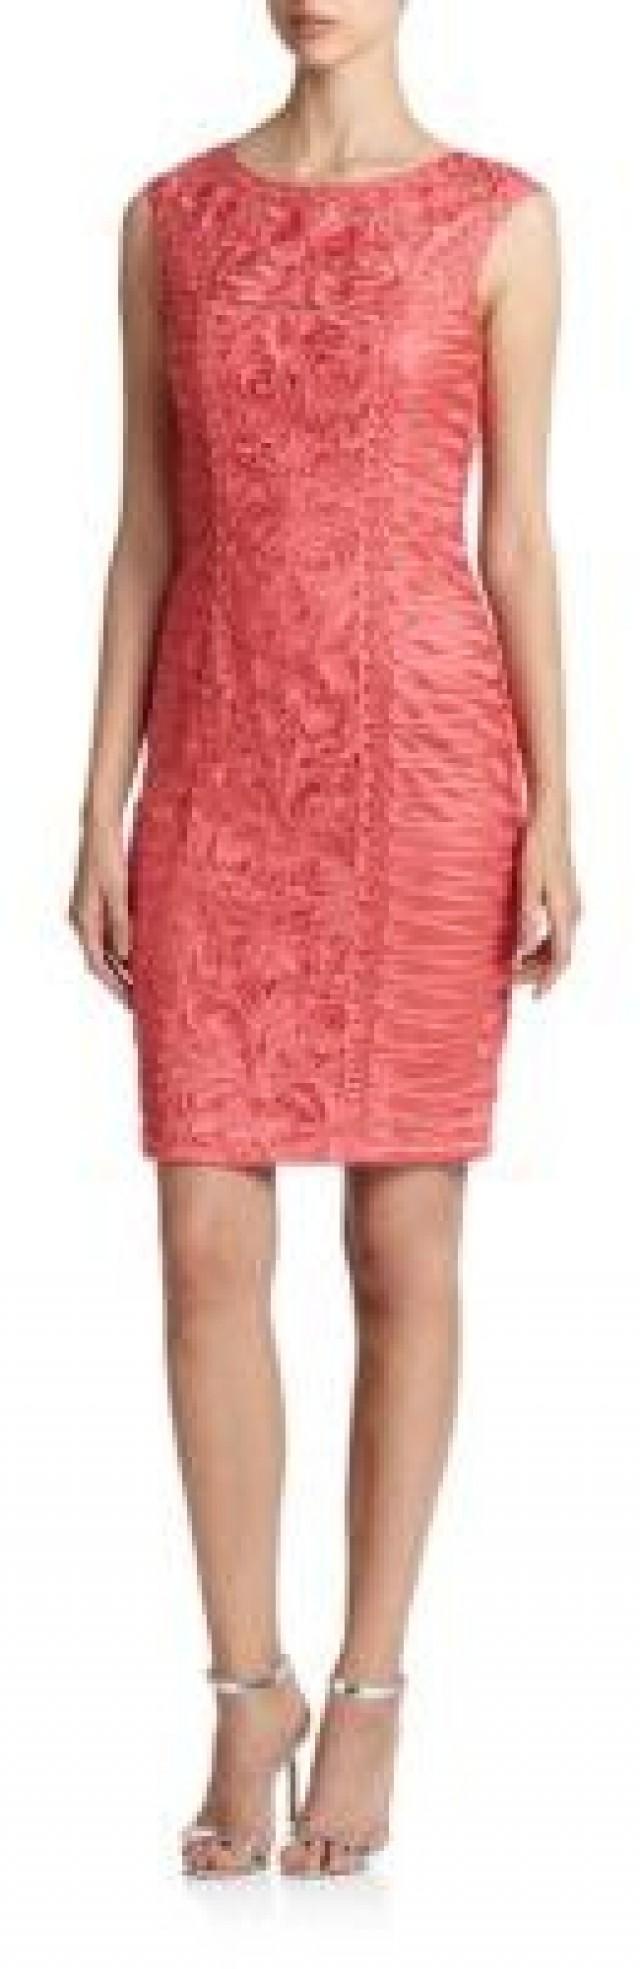 Sue wong soutache cap sleeve sheath dress 2408569 weddbook for Sue wong robes de mariage